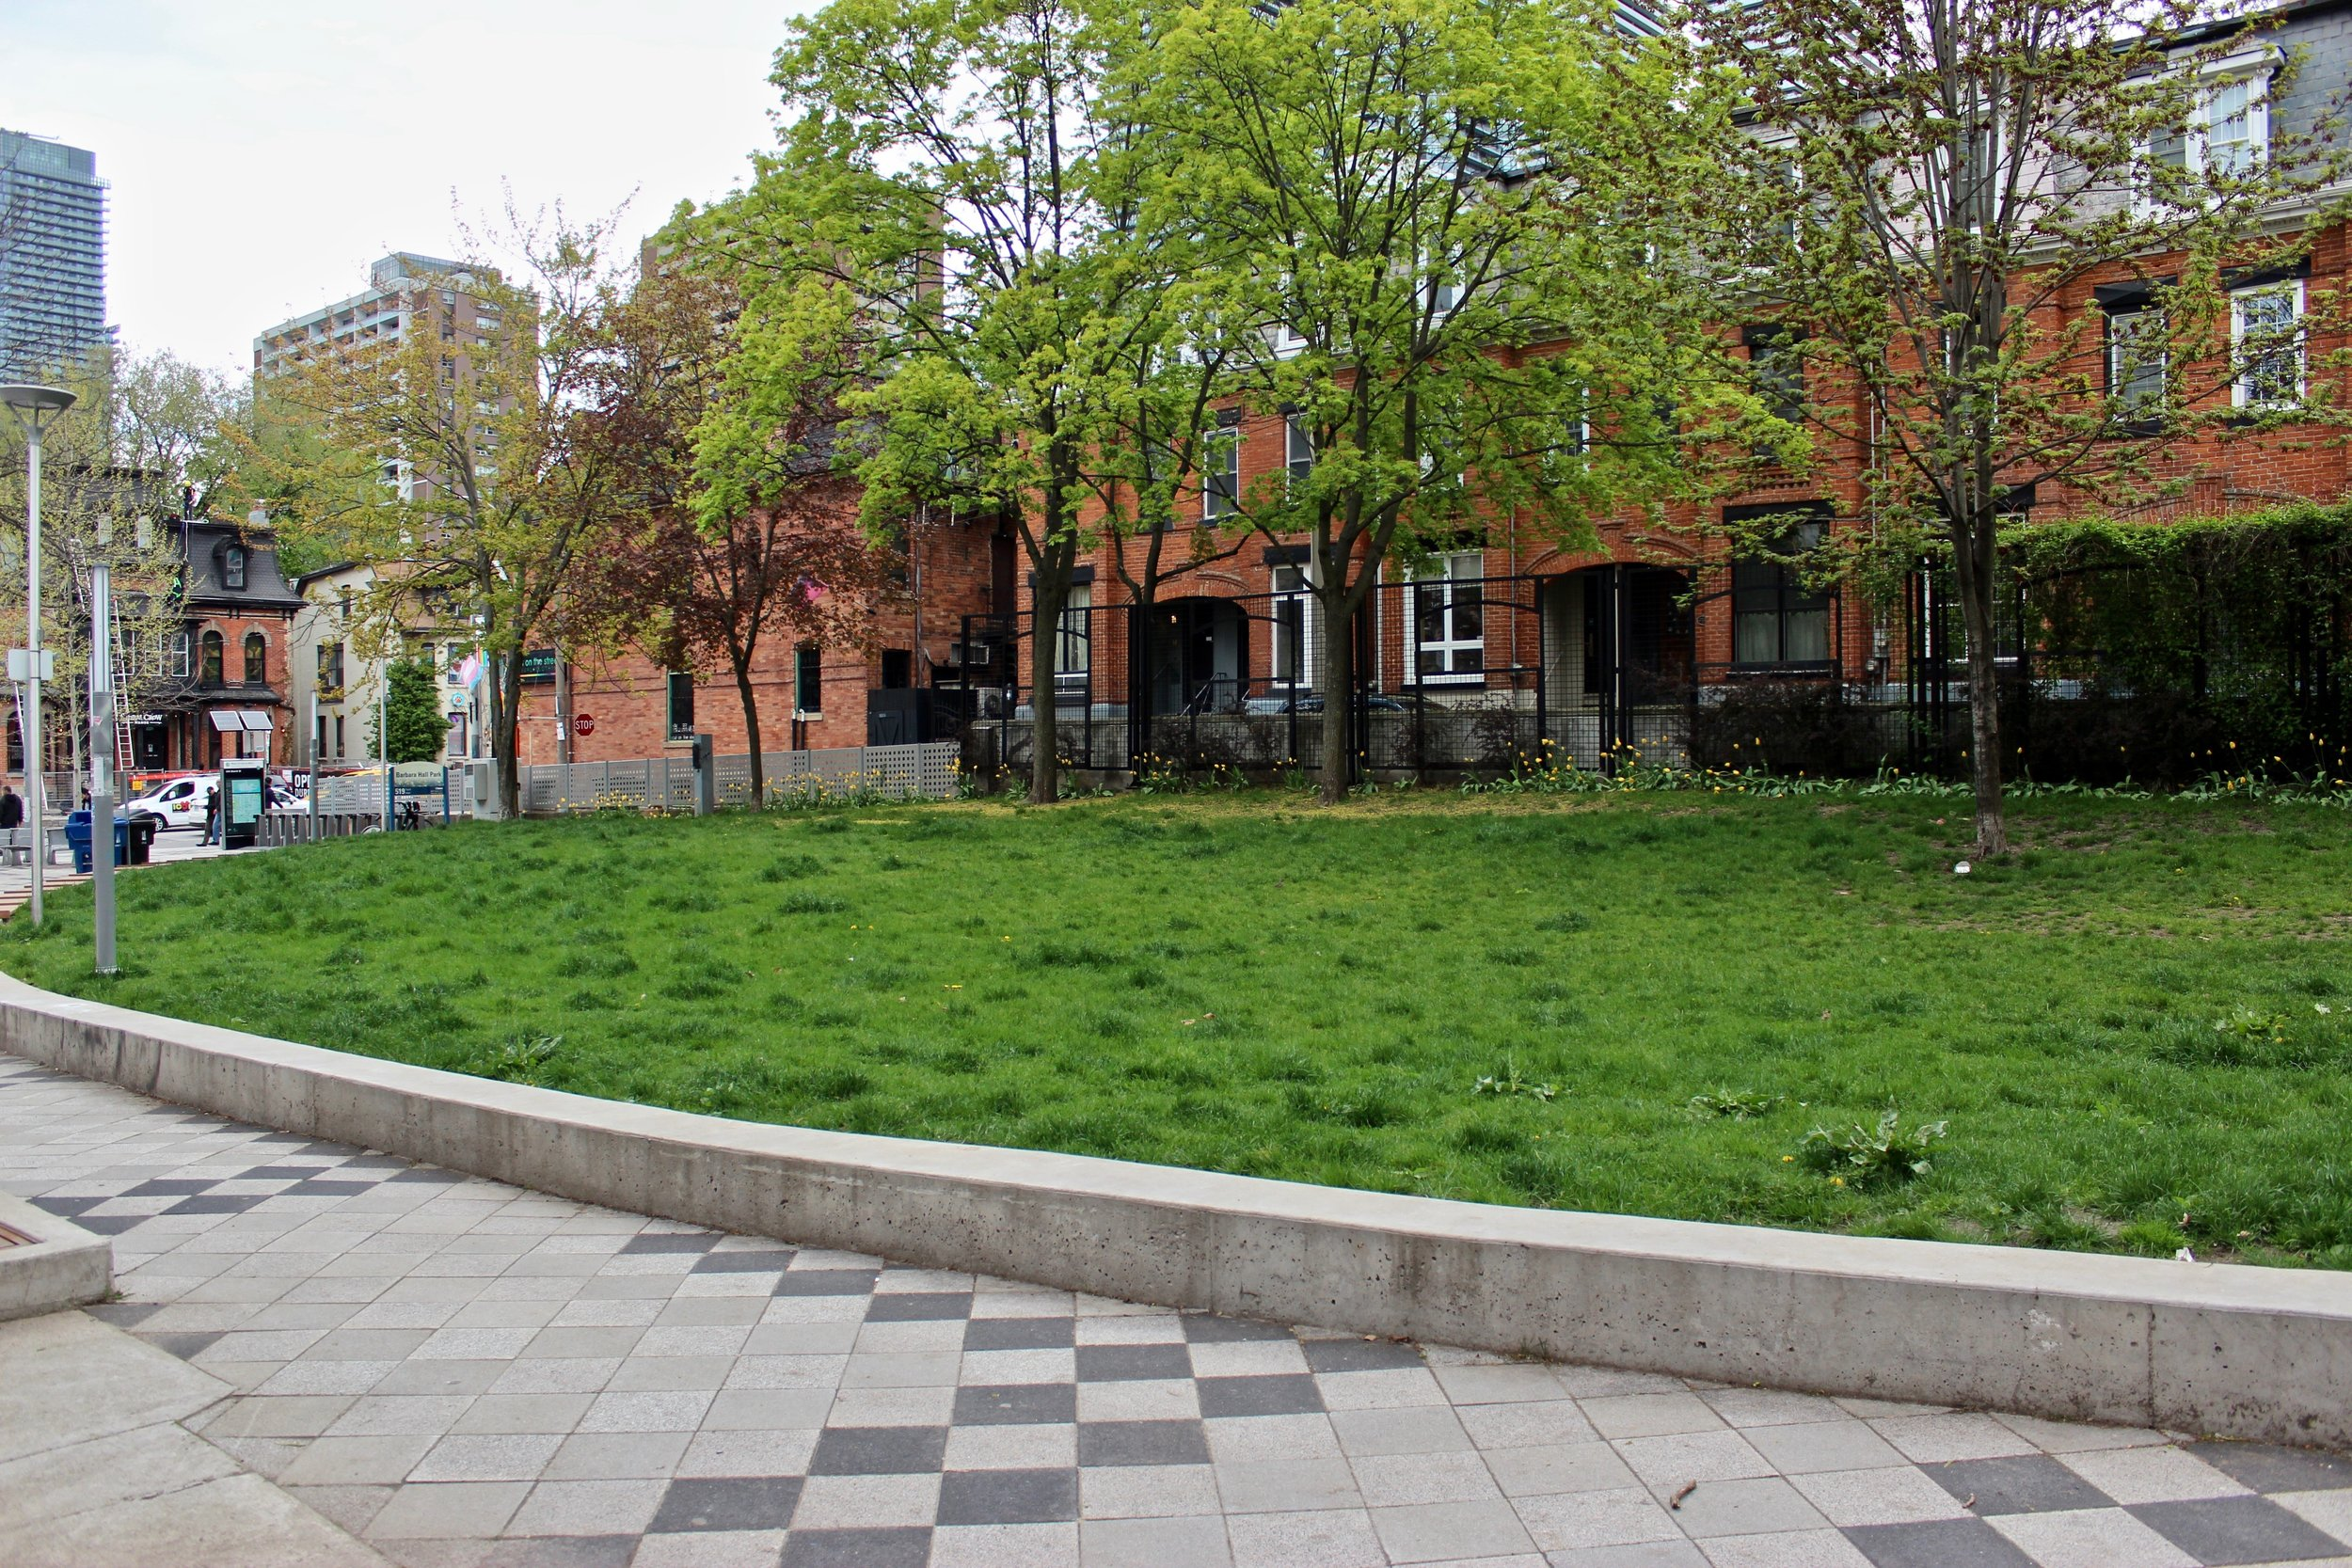 Barbara hall Places to Picnic Neary Yonge-Dundas Square.jpg